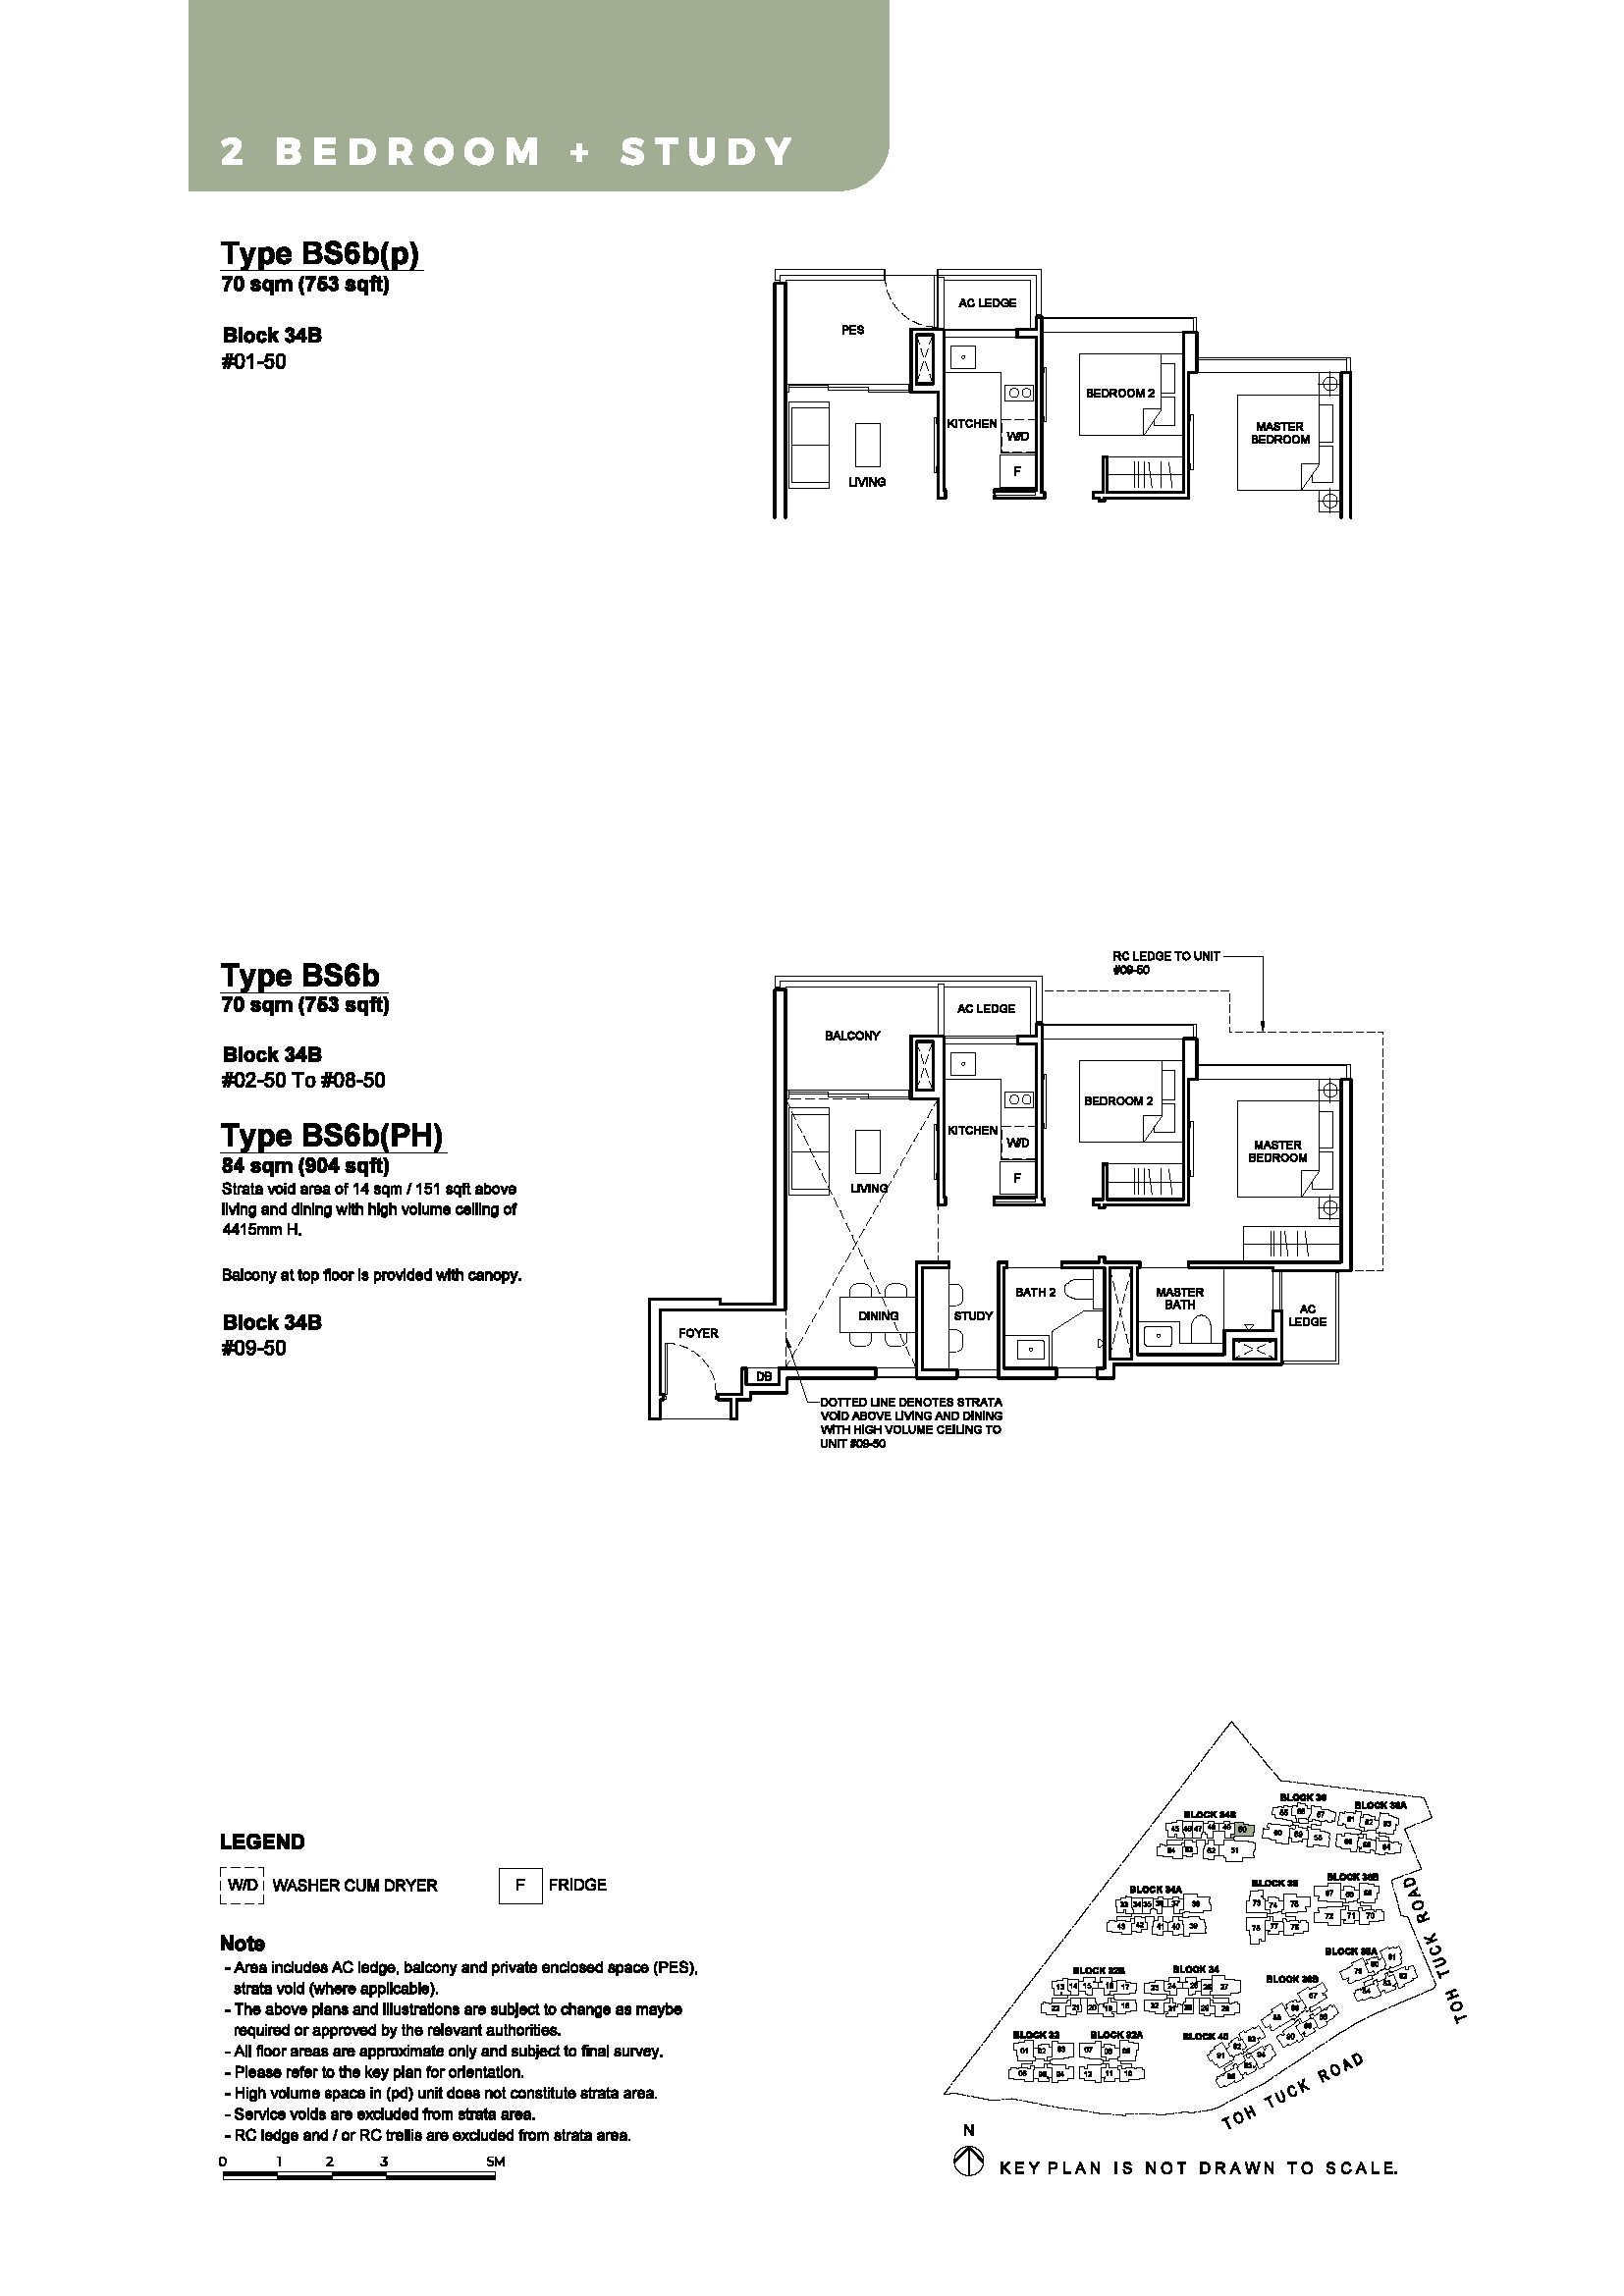 Type BS6b, BS6b(p), BS6b(PH)